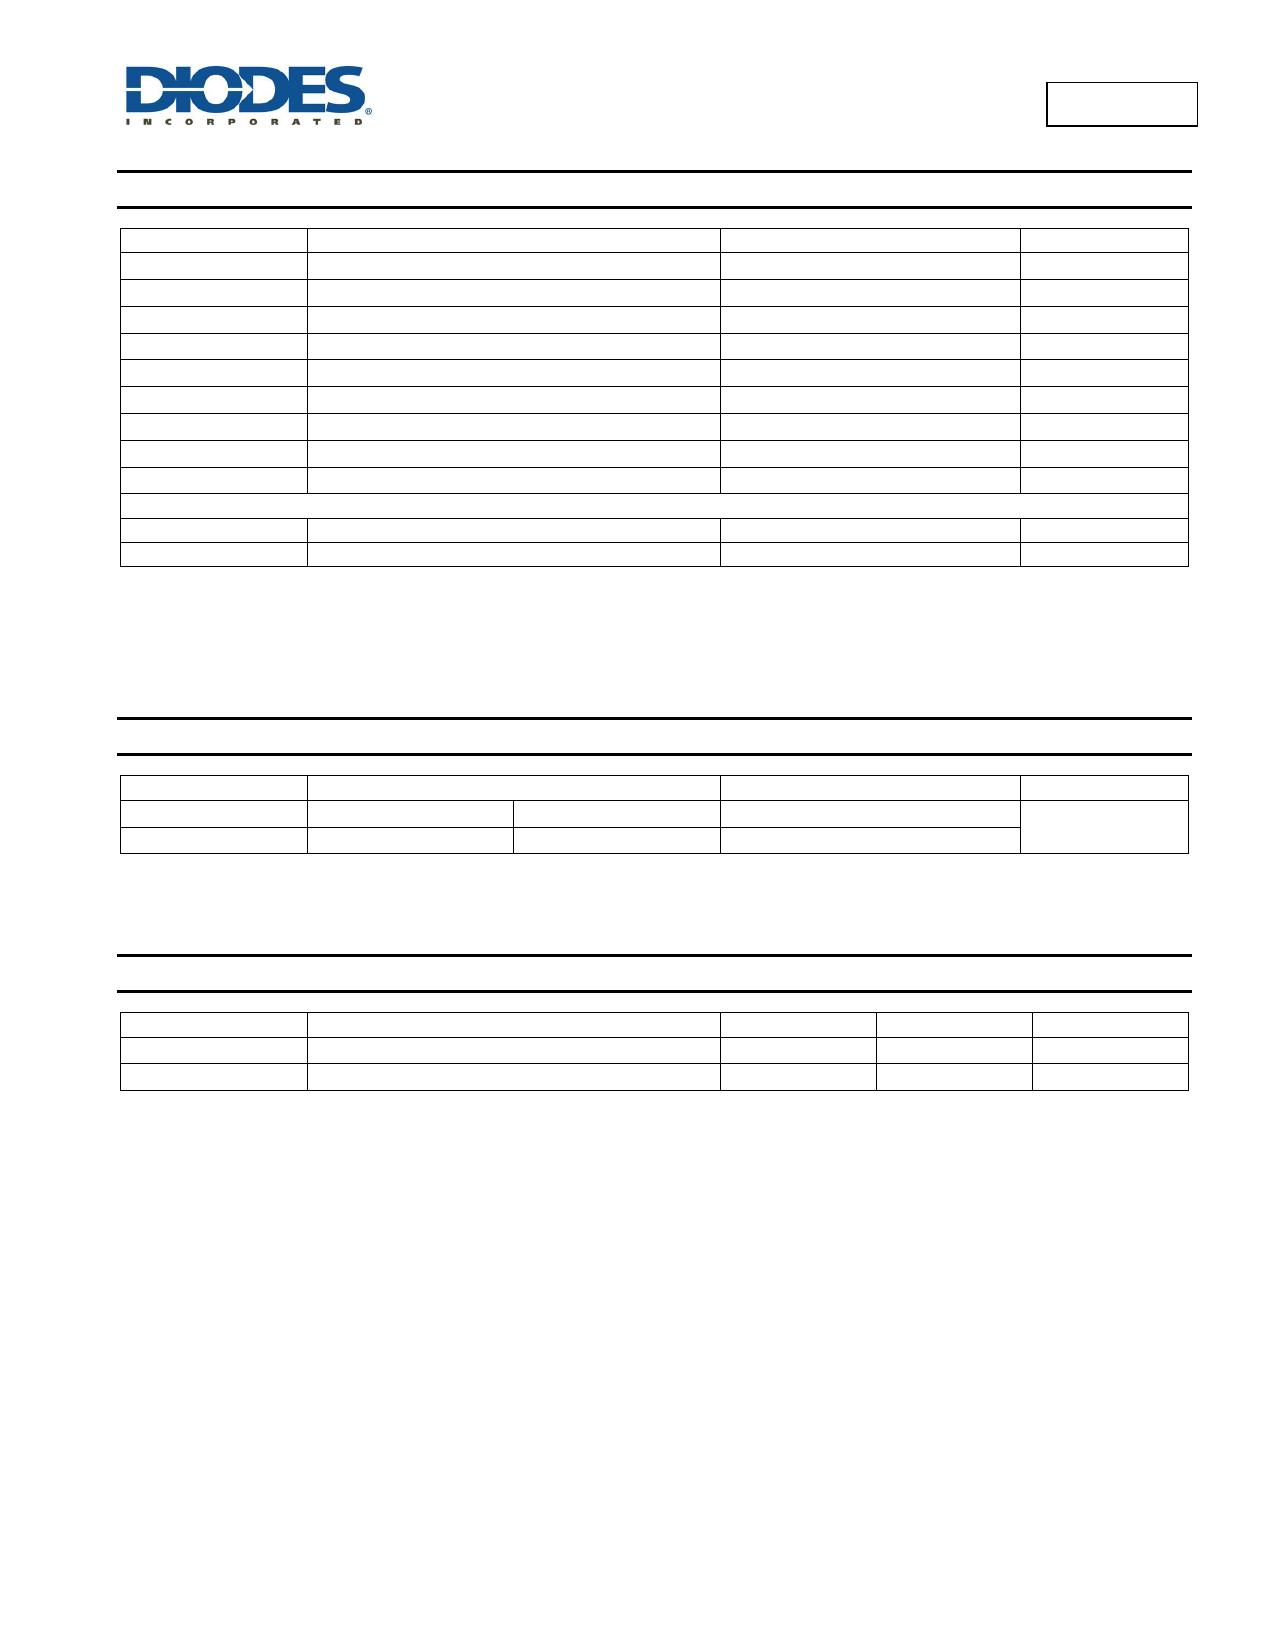 AP6502A pdf, 電子部品, 半導体, ピン配列